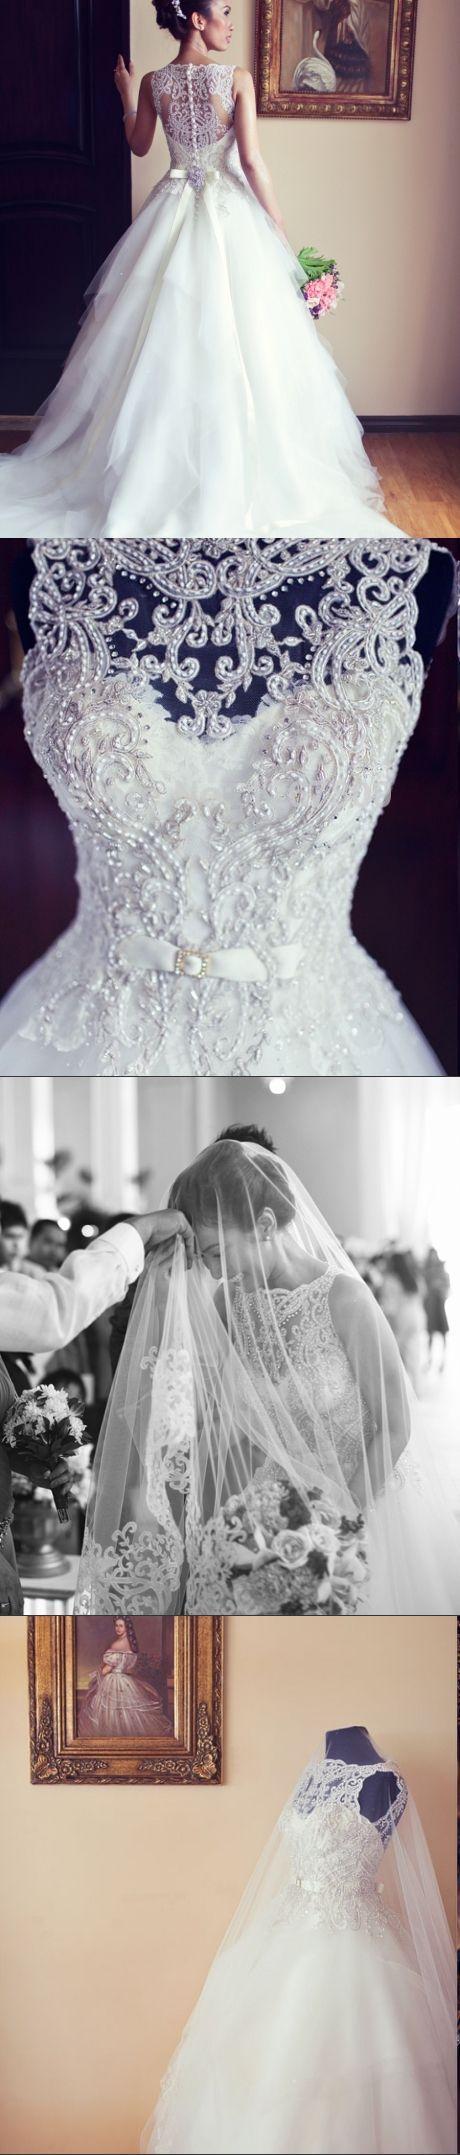 Mariage - Fairytale Wedding Dresses